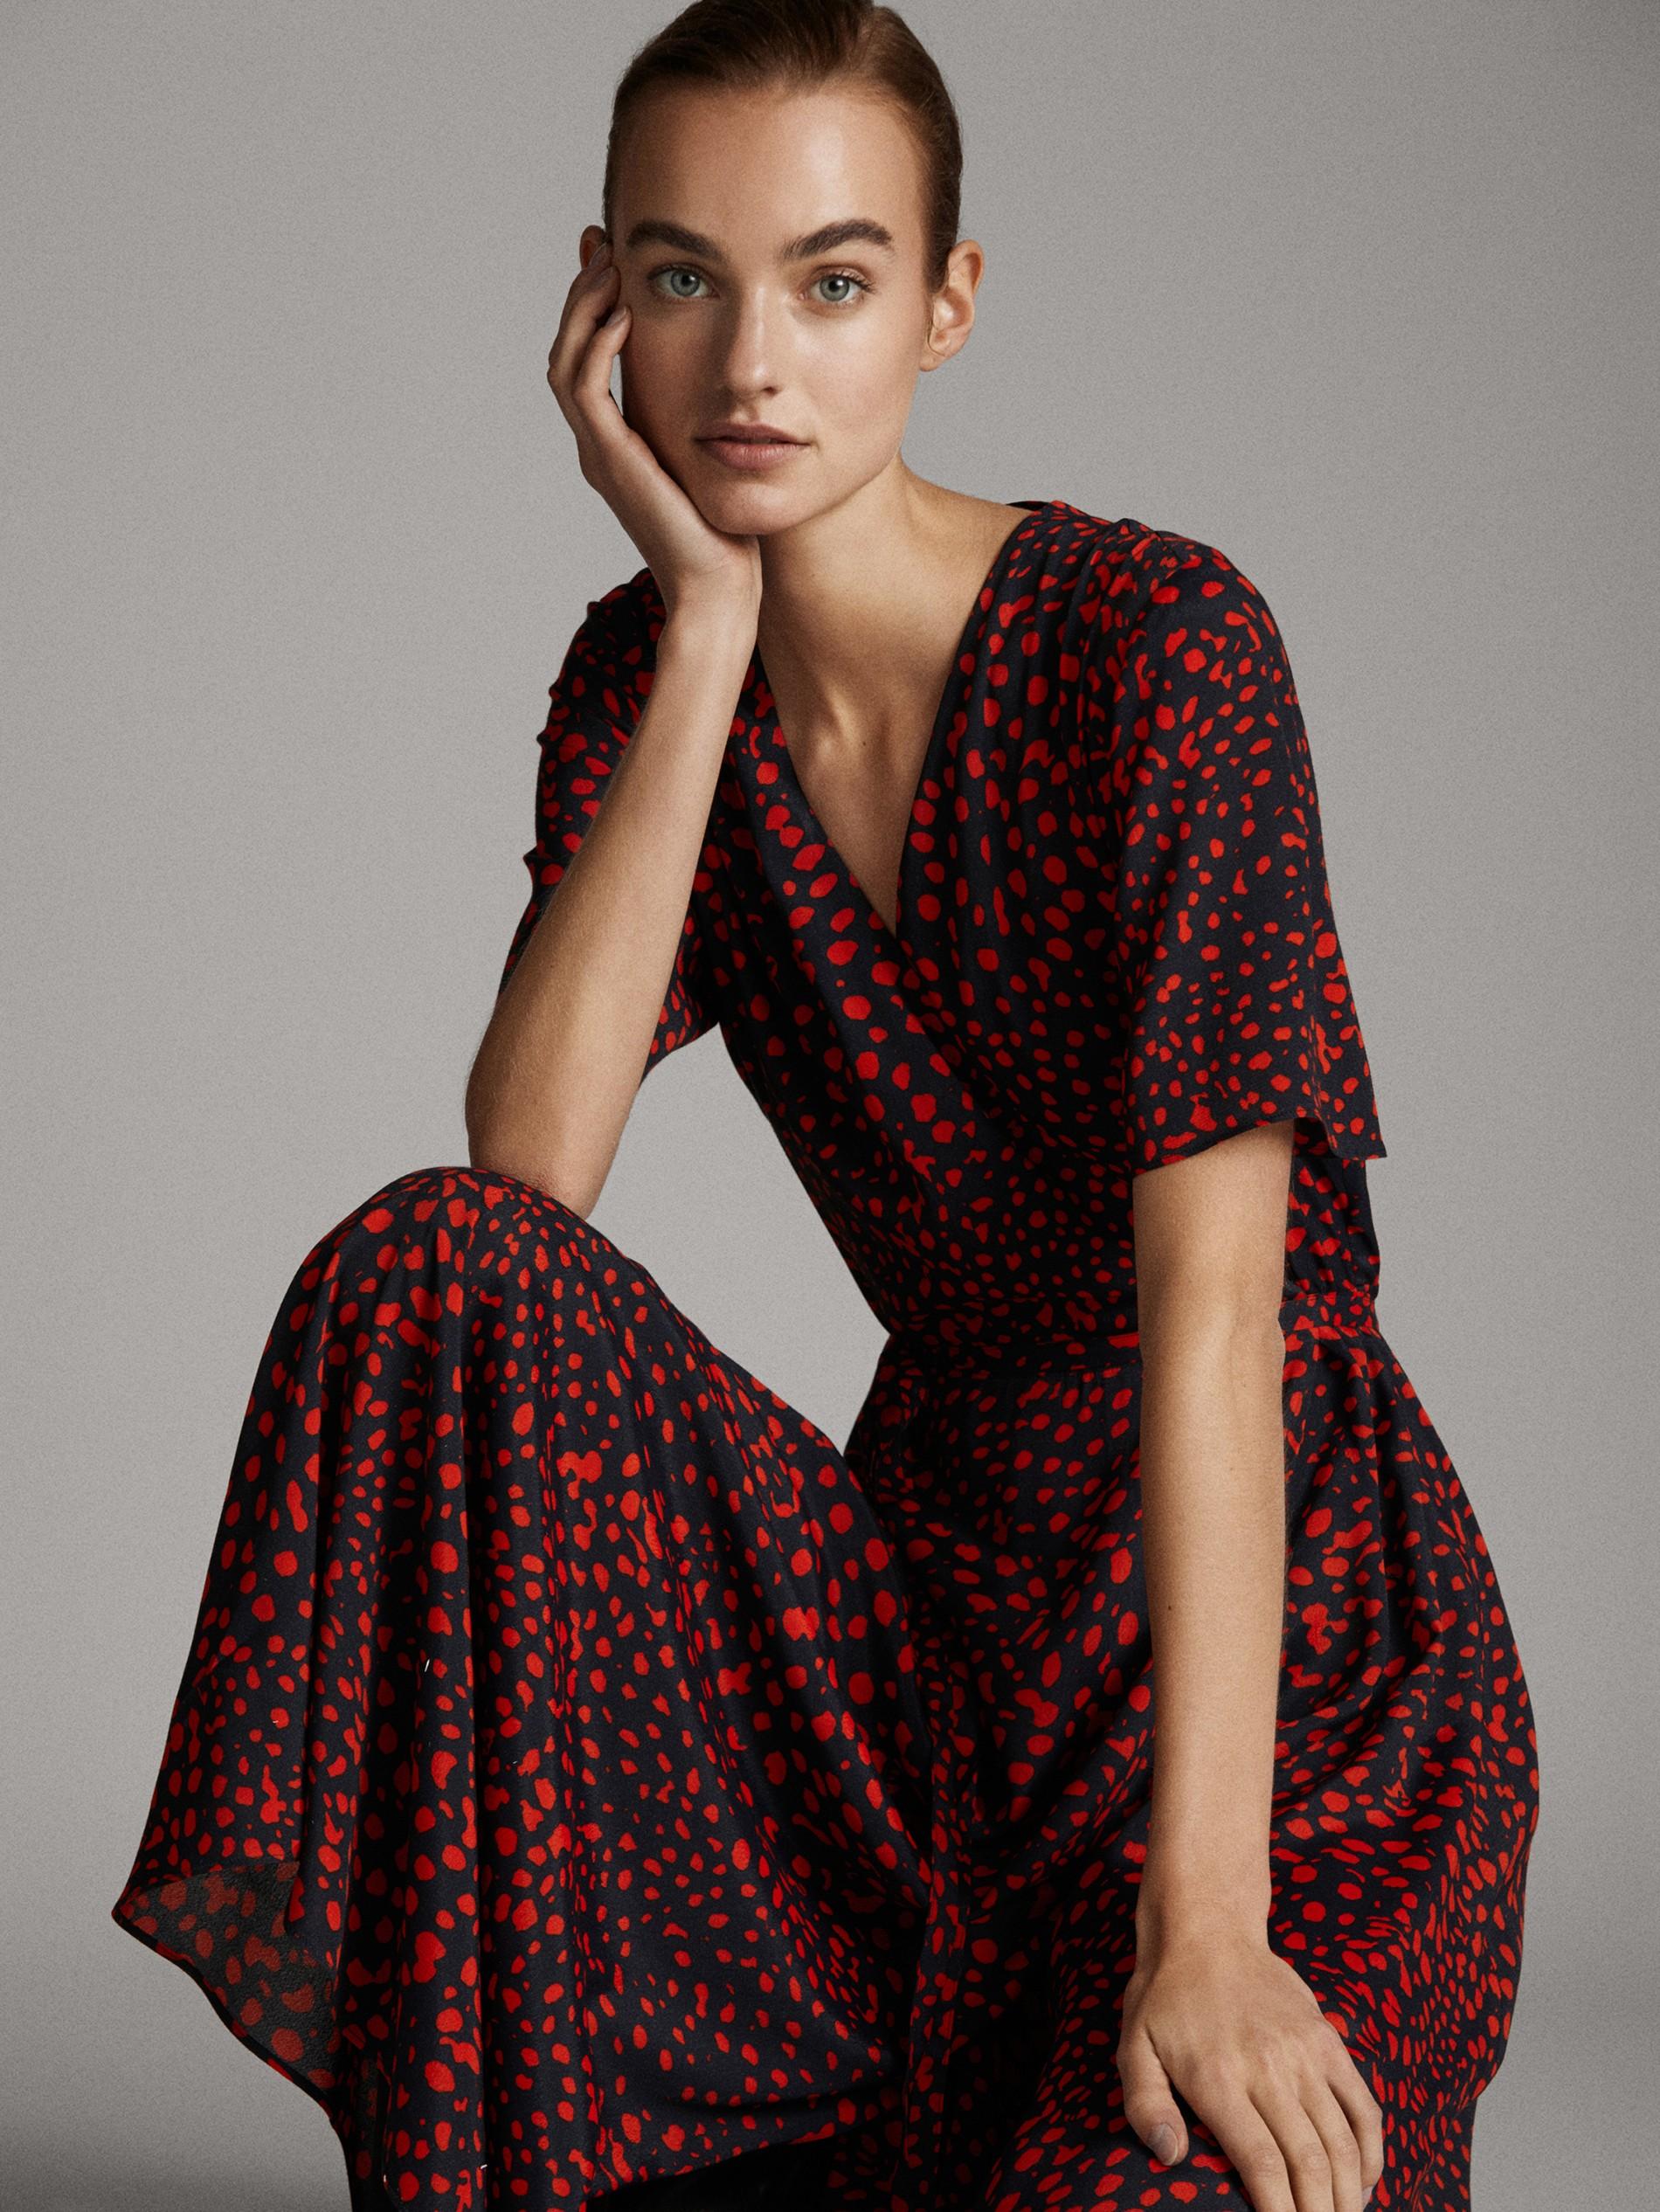 Massimo Dutti Collection Femmes Robes Combinaisons France Et ZiPXuOk